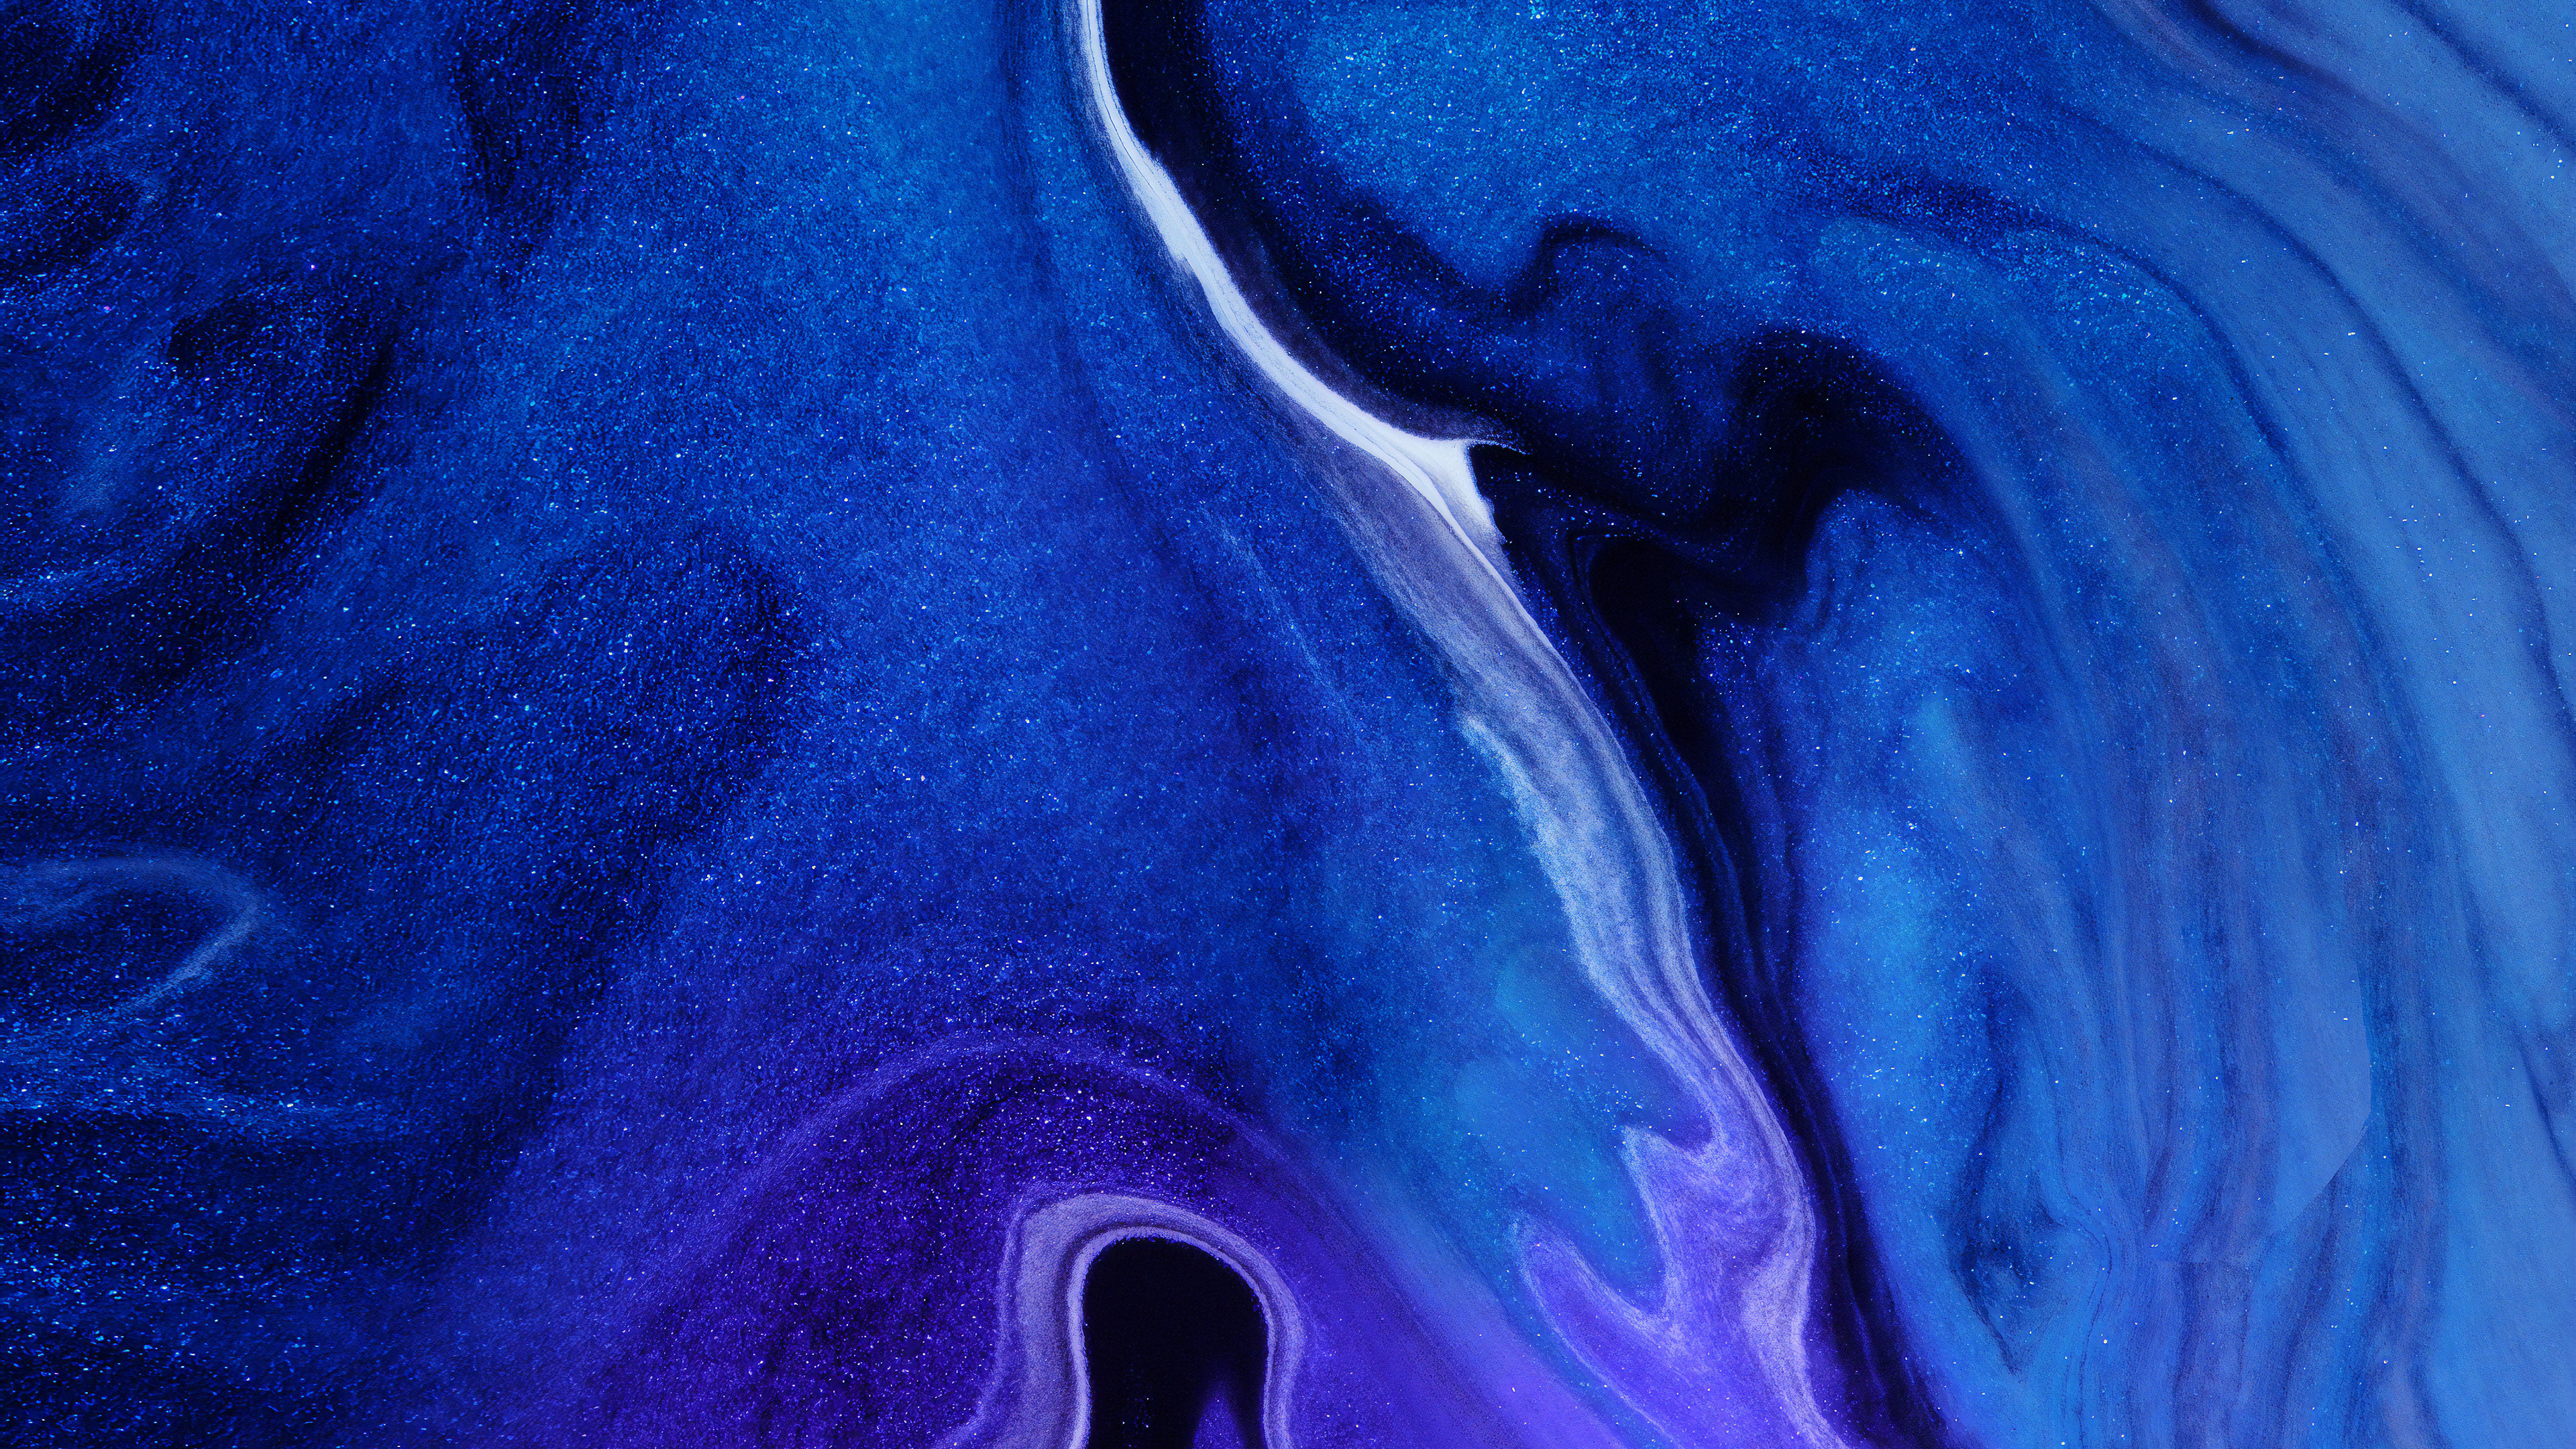 dark blue color burst 1563221437 - Dark Blue Color Burst - hd-wallpapers, digital art wallpapers, blue wallpapers, artwork wallpapers, artist wallpapers, abstract wallpapers, 4k-wallpapers